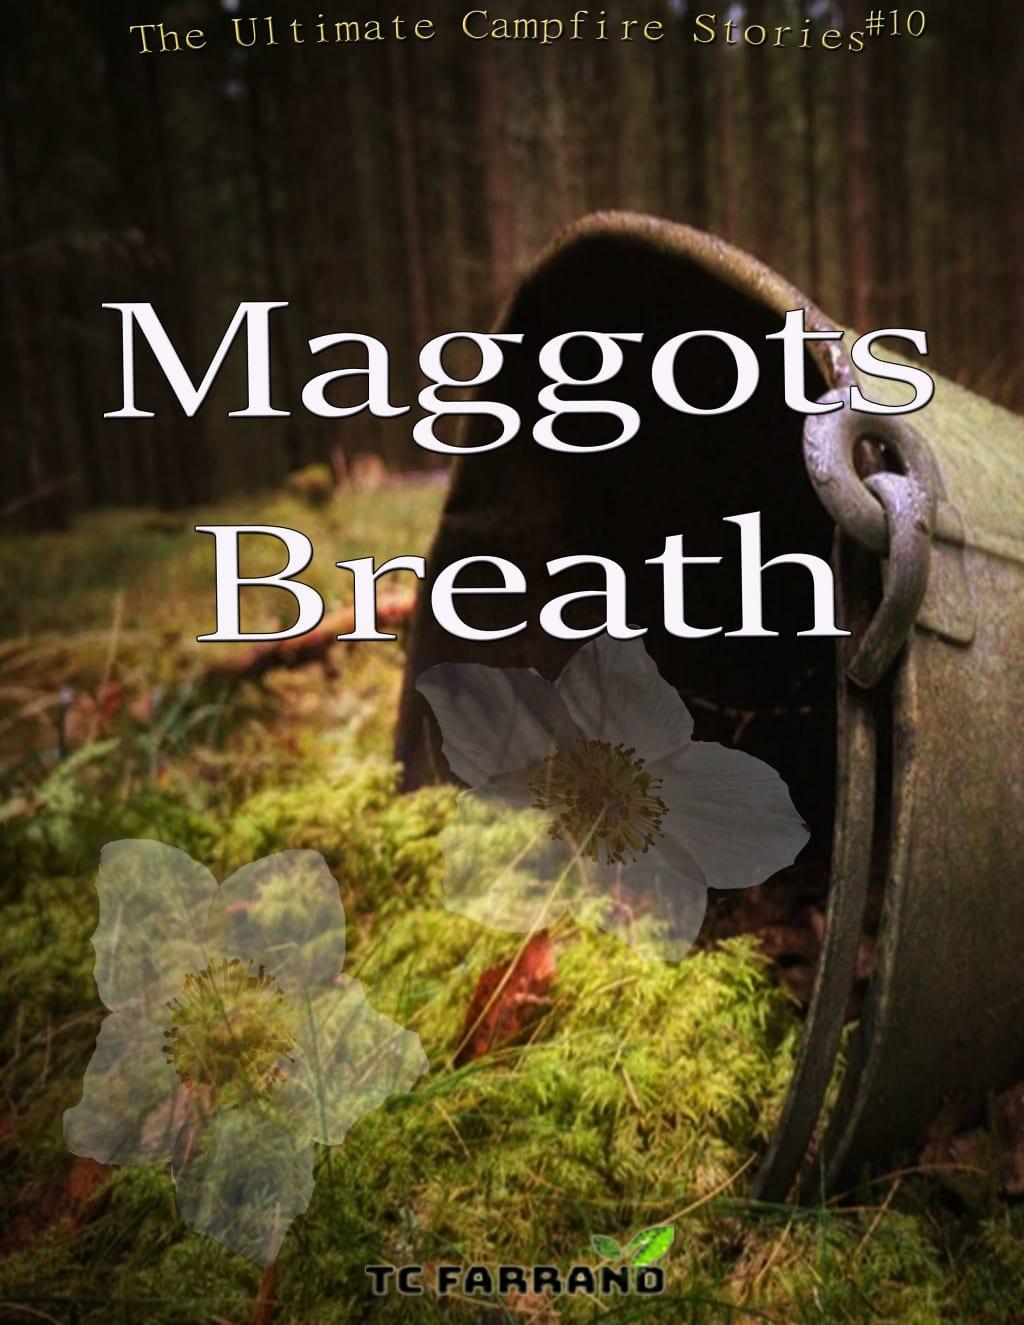 Maggots Breath